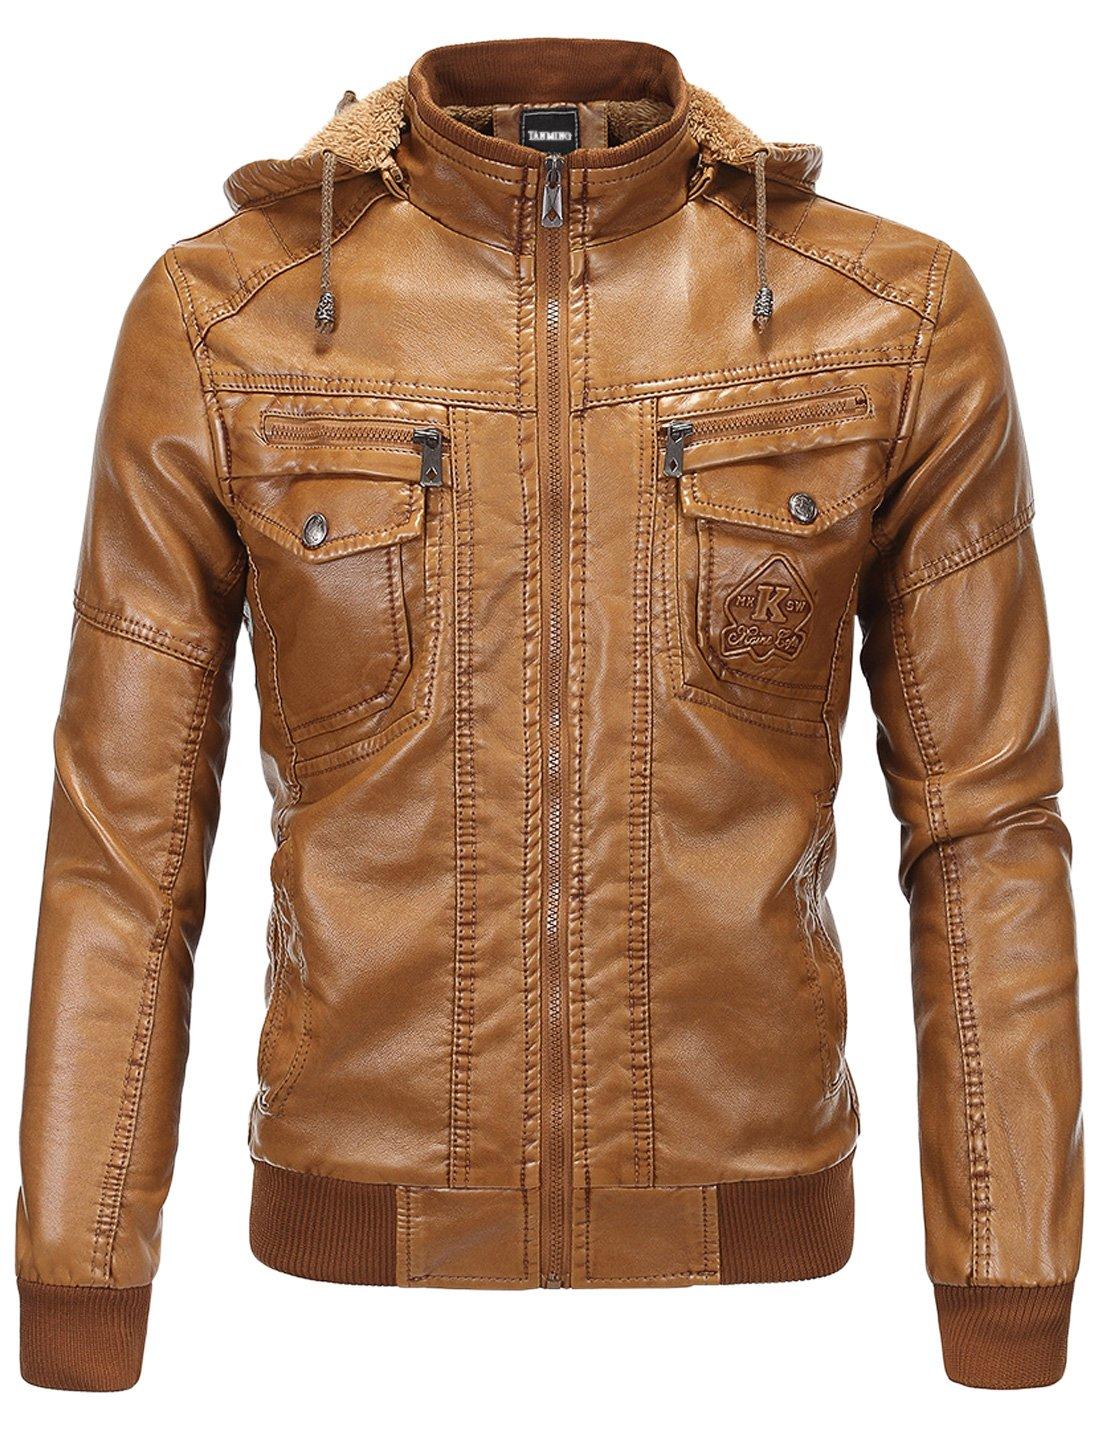 Tanming Men's Pu Leather Jacket with Removable Fur Hood Tanming-100340